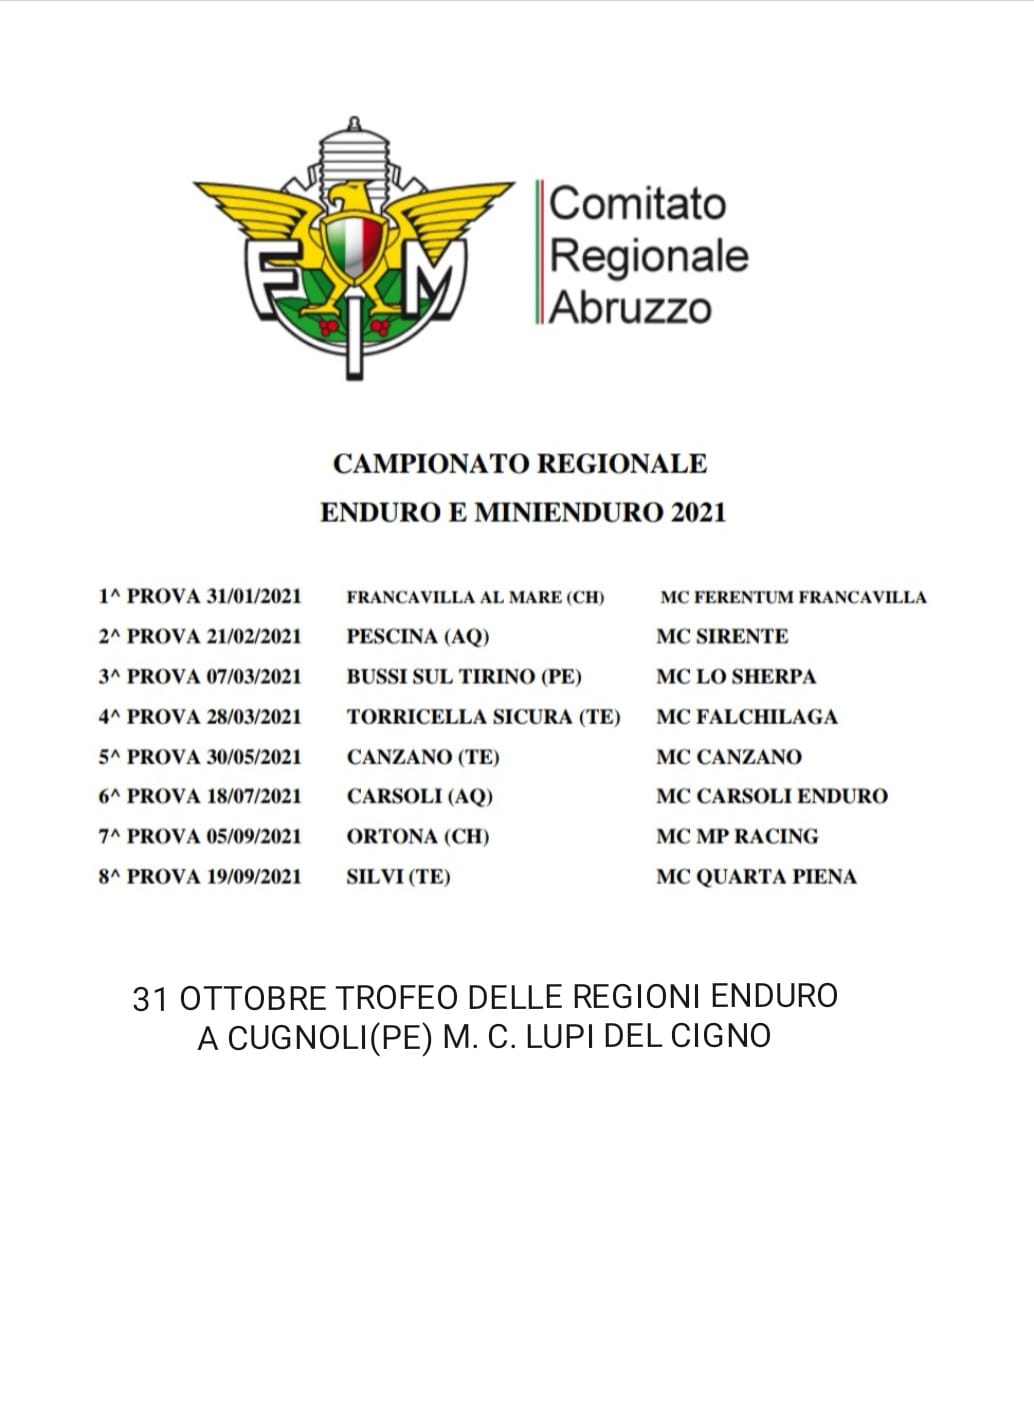 Calendario Enduro Regionale 2021 Calendario Campionato Regionale Enduro e Minienduro 2021 | Fmi